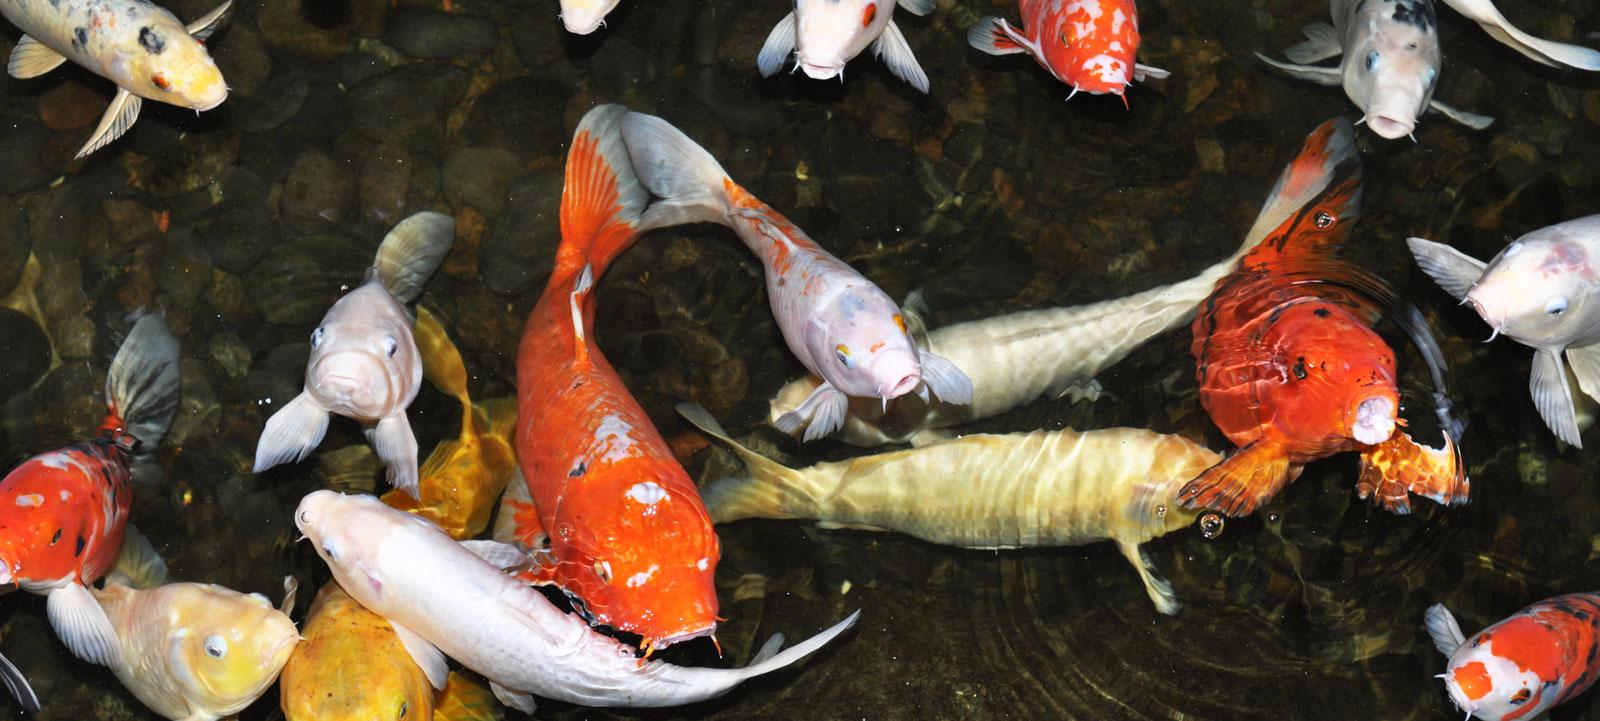 Les carpes koi archives jardins aquatiques for Koi qui saute hors de l eau